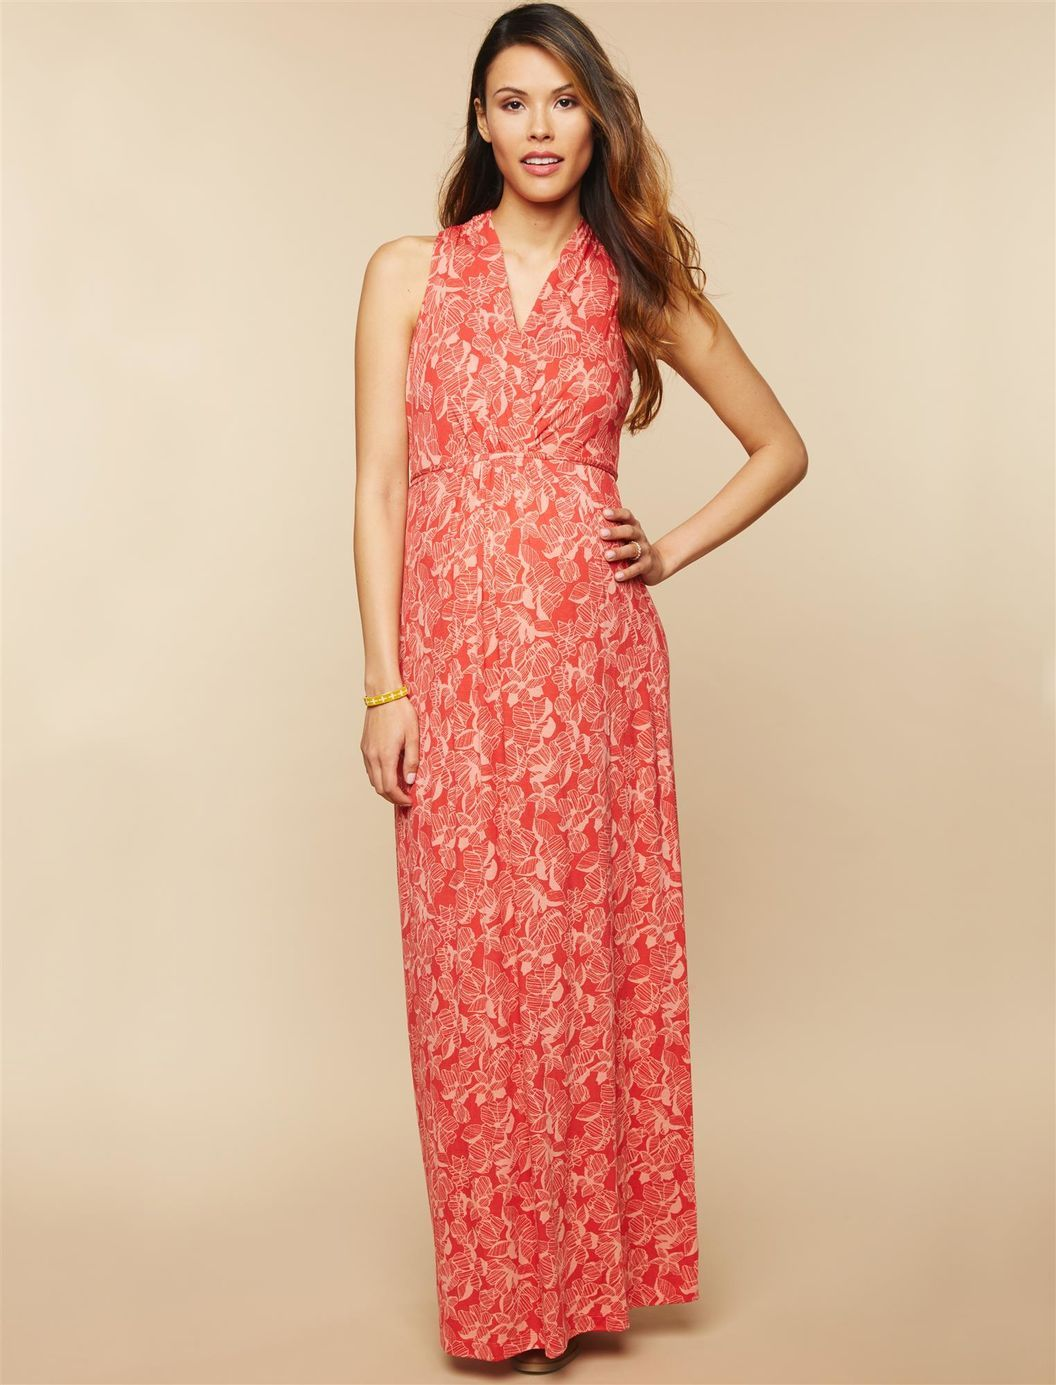 3ad5fdaf9bd Surplice Neckline Maternity Maxi Dress- Red Floral Print ...